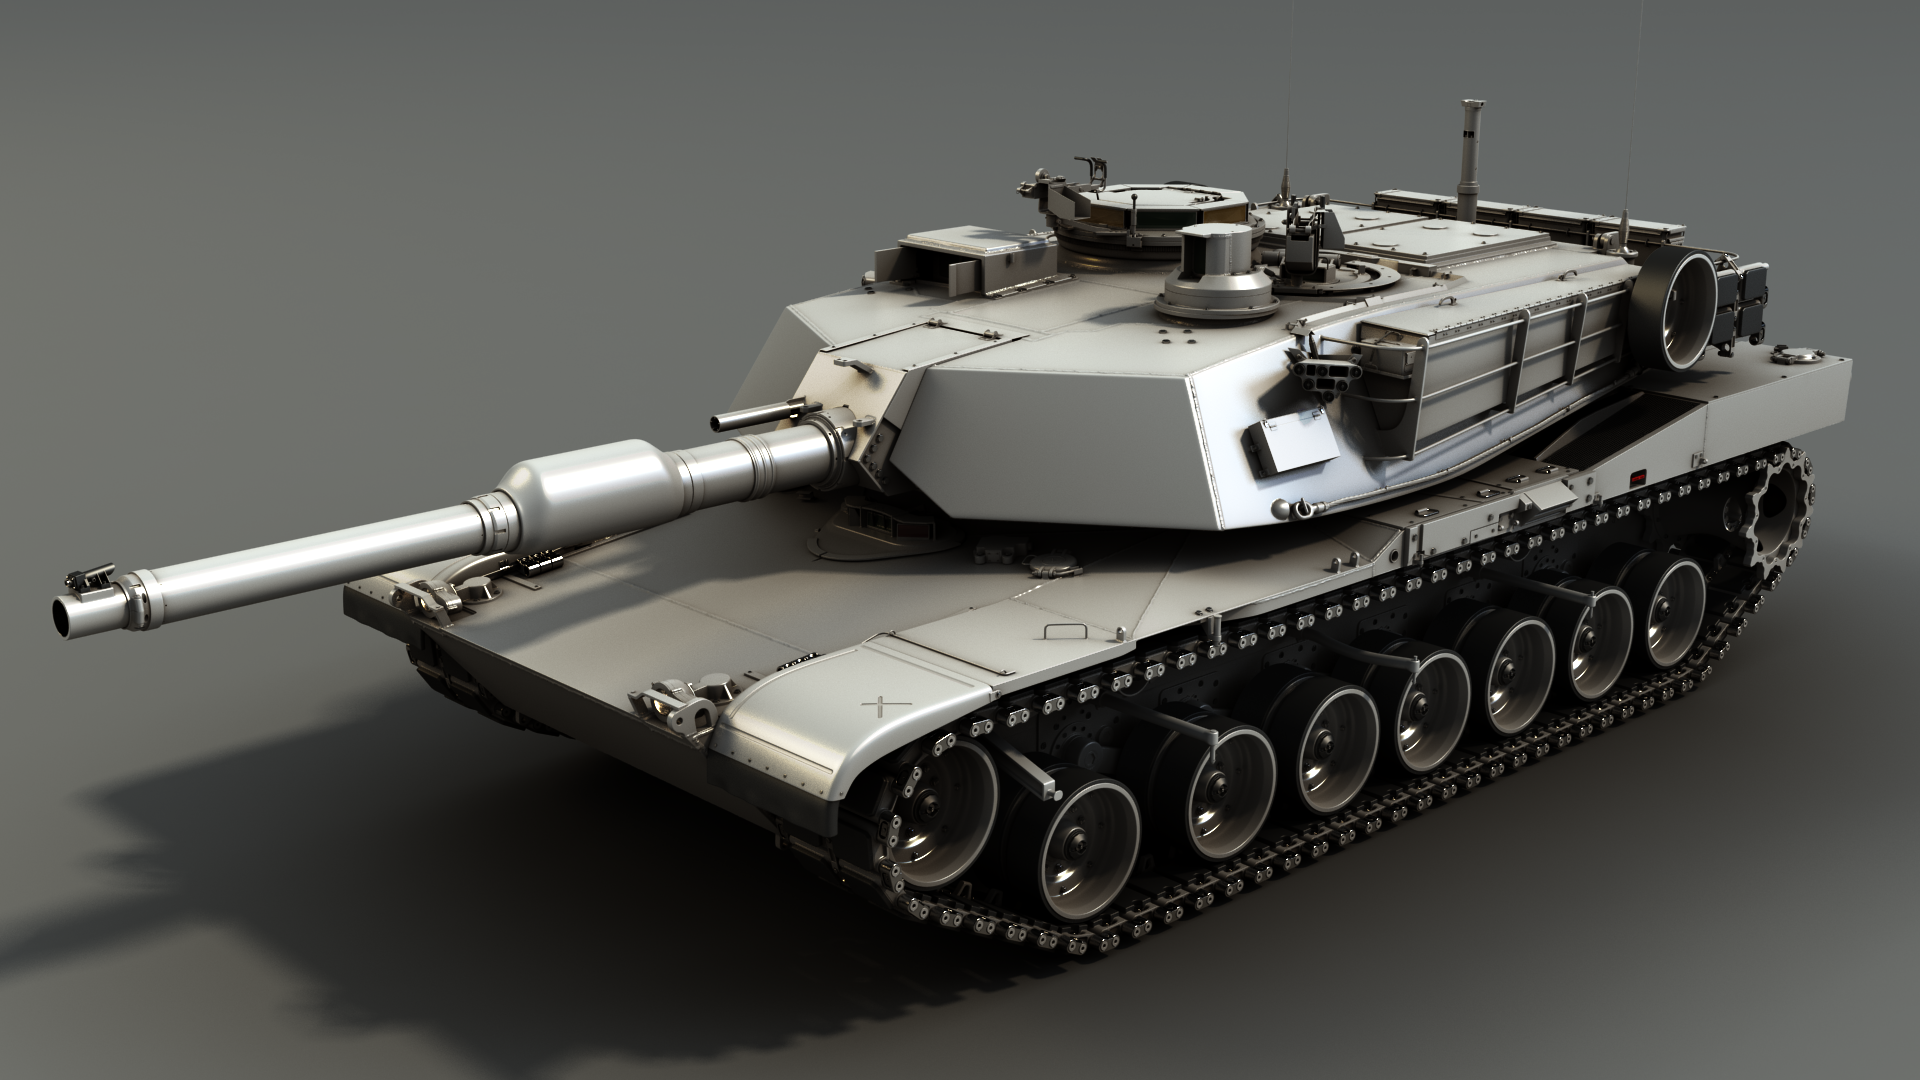 Military - Tank Wallpaper - Tank HD PNG